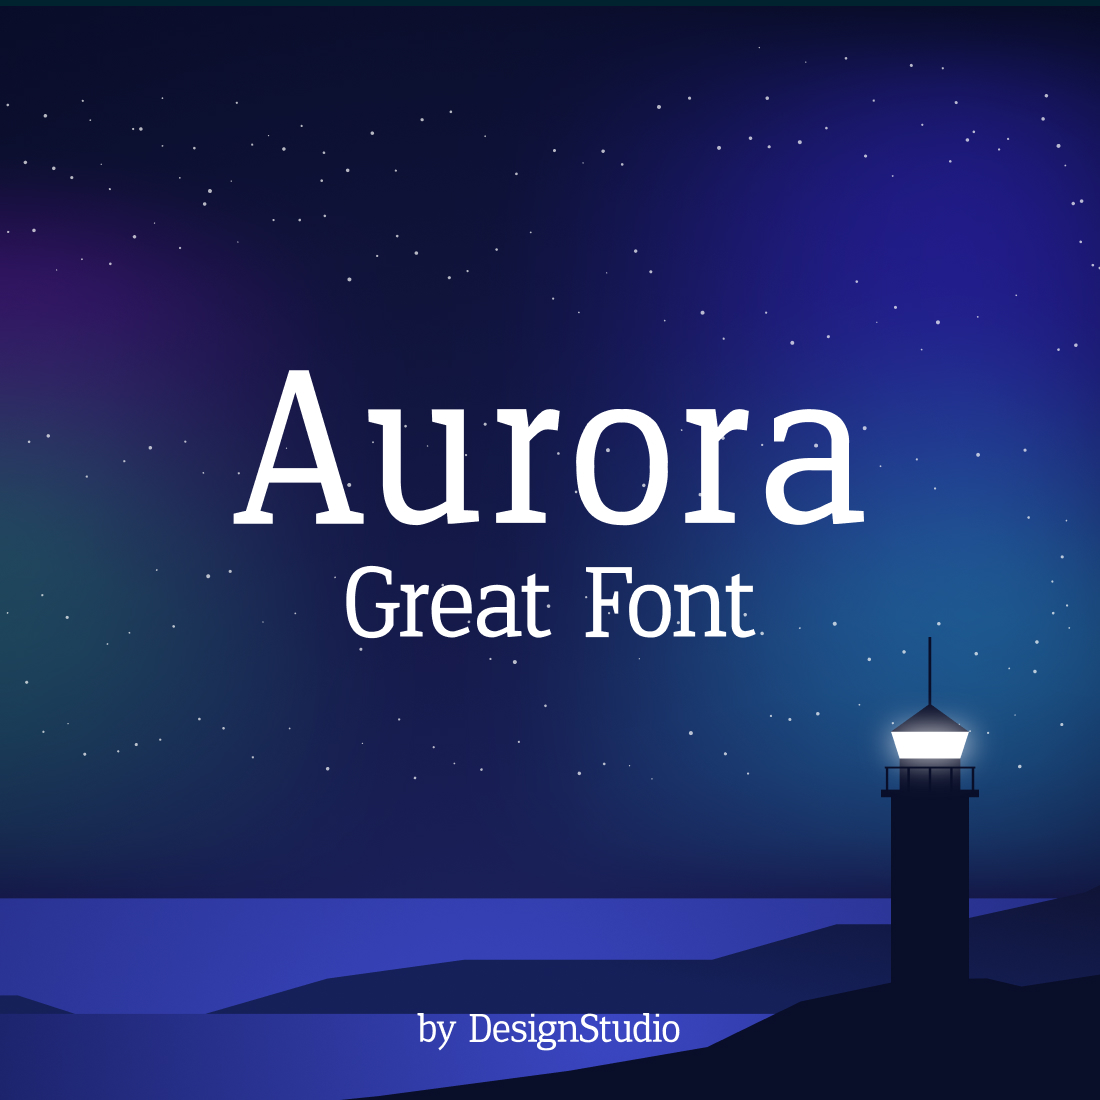 Aurora Monospaced Serif Font cover image.